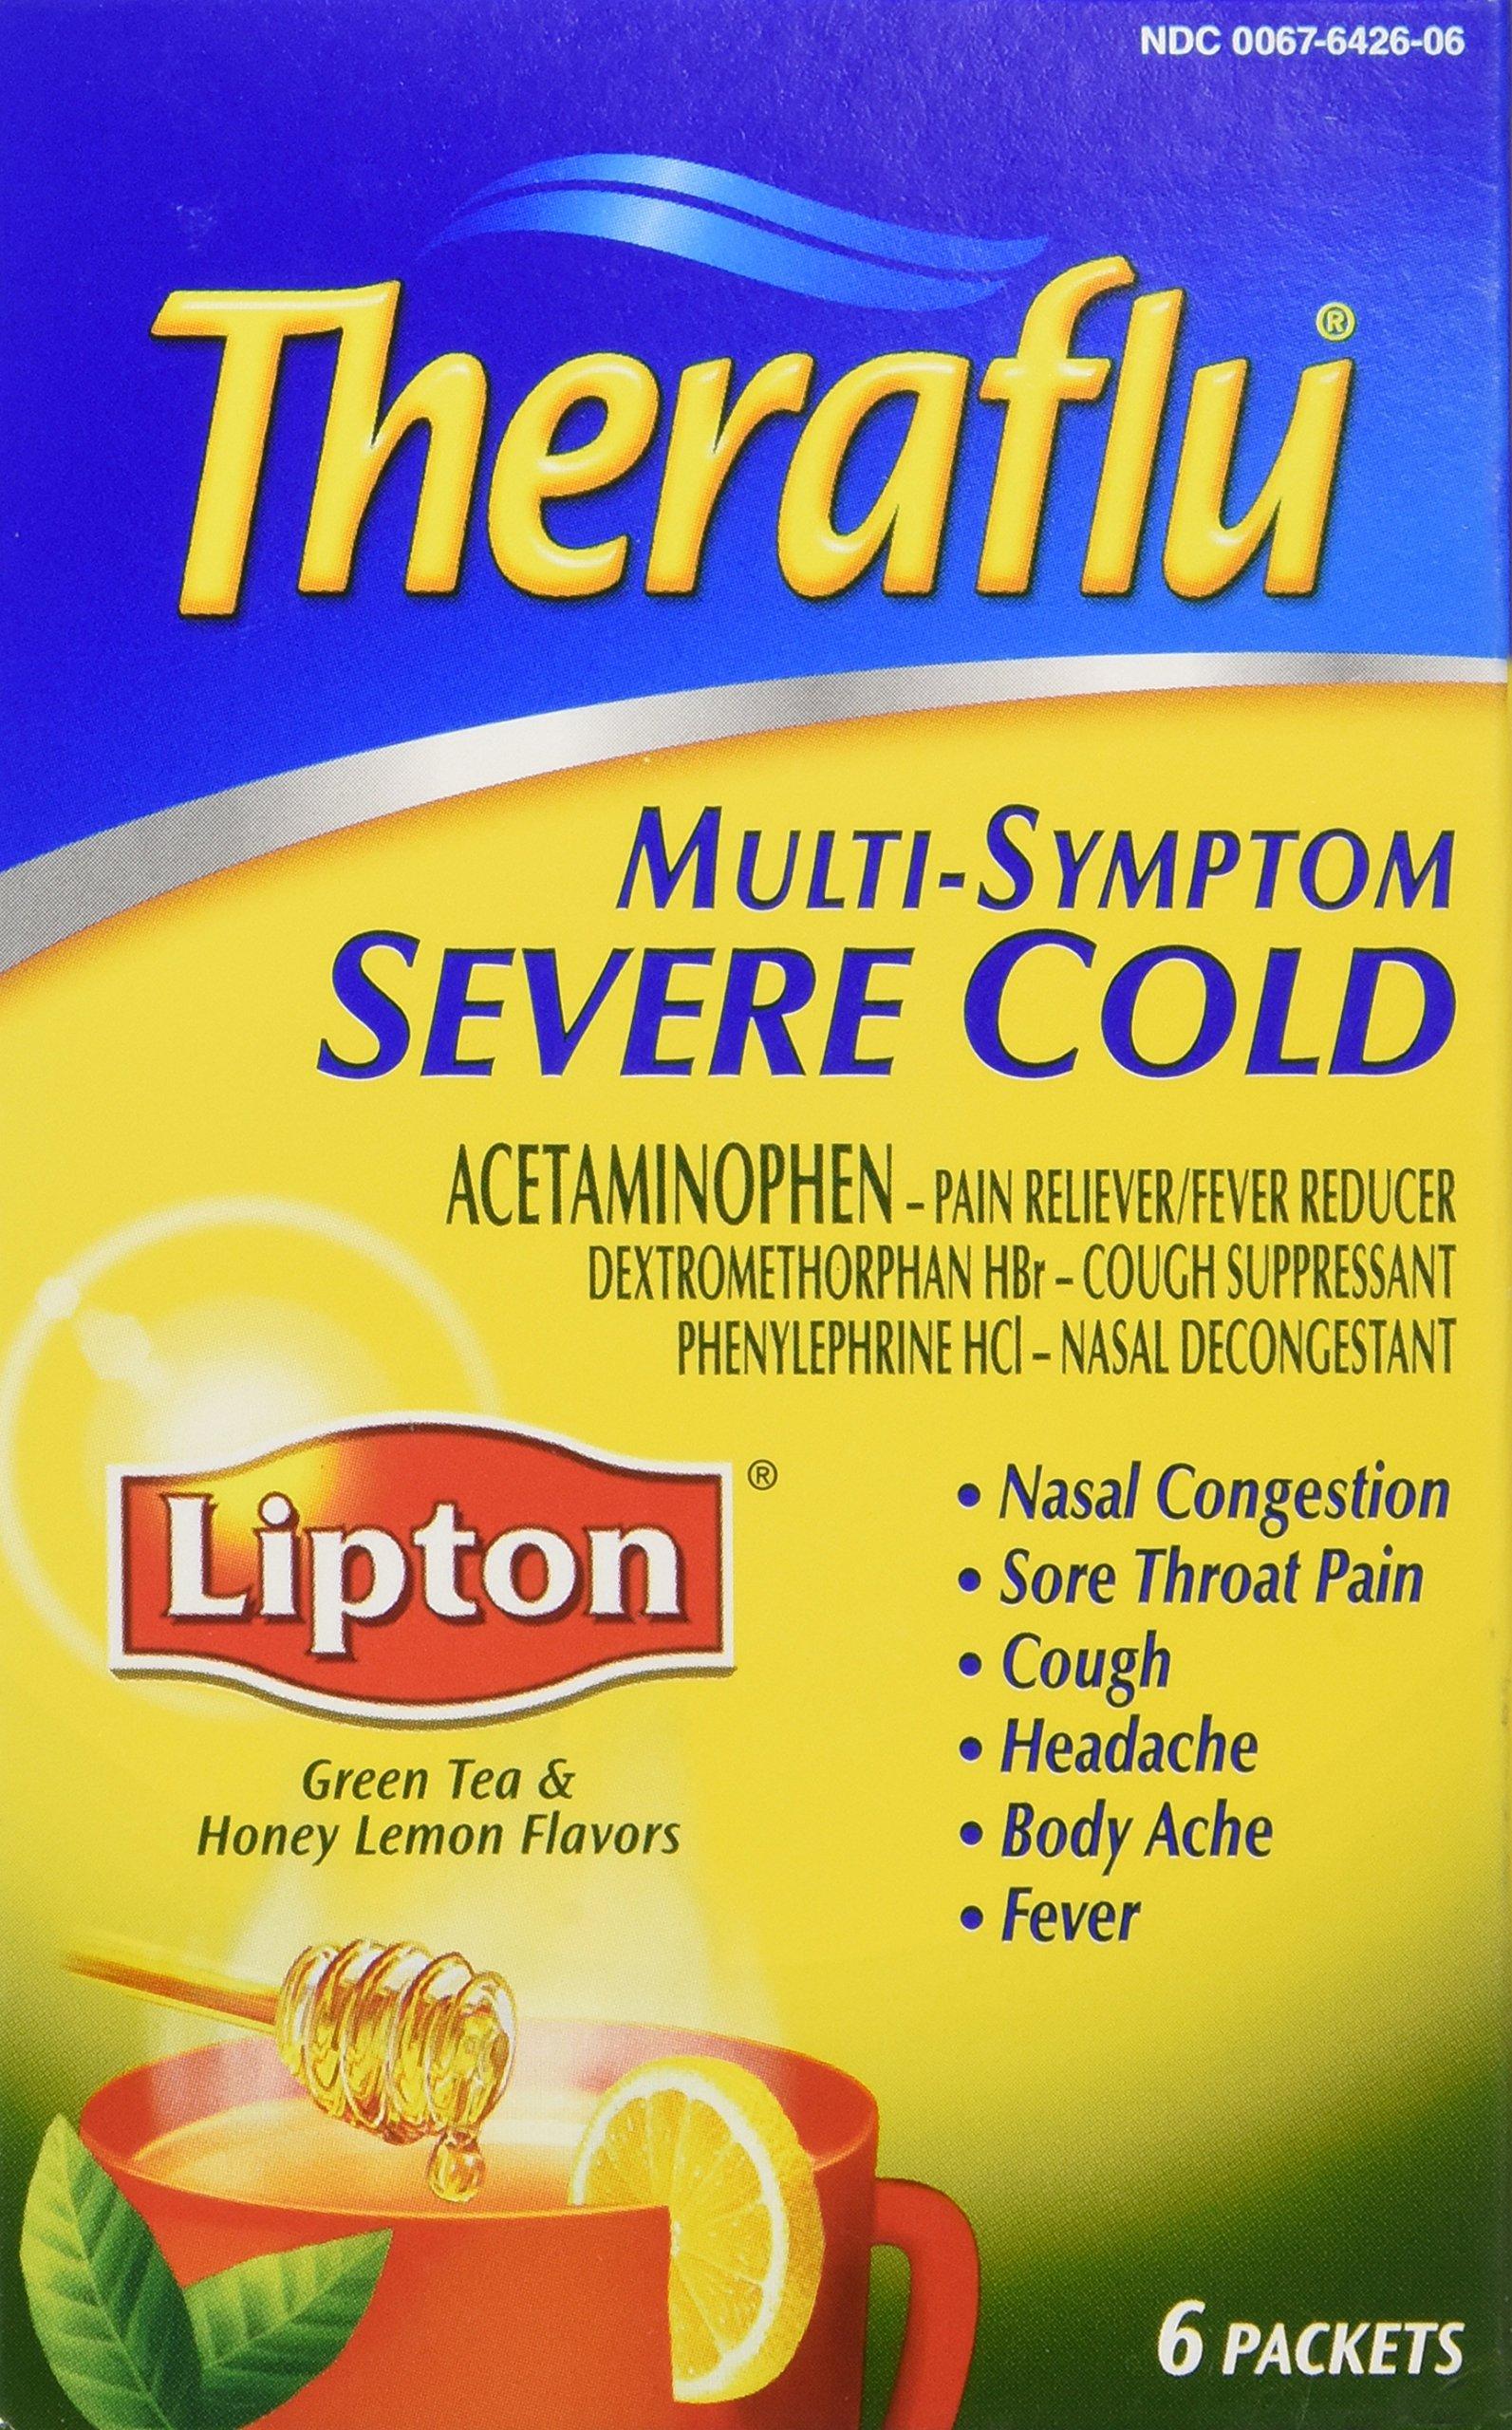 Theraflu Multi Symptom Severe Cold w/Lipton-Honey Lemon, 6 ct